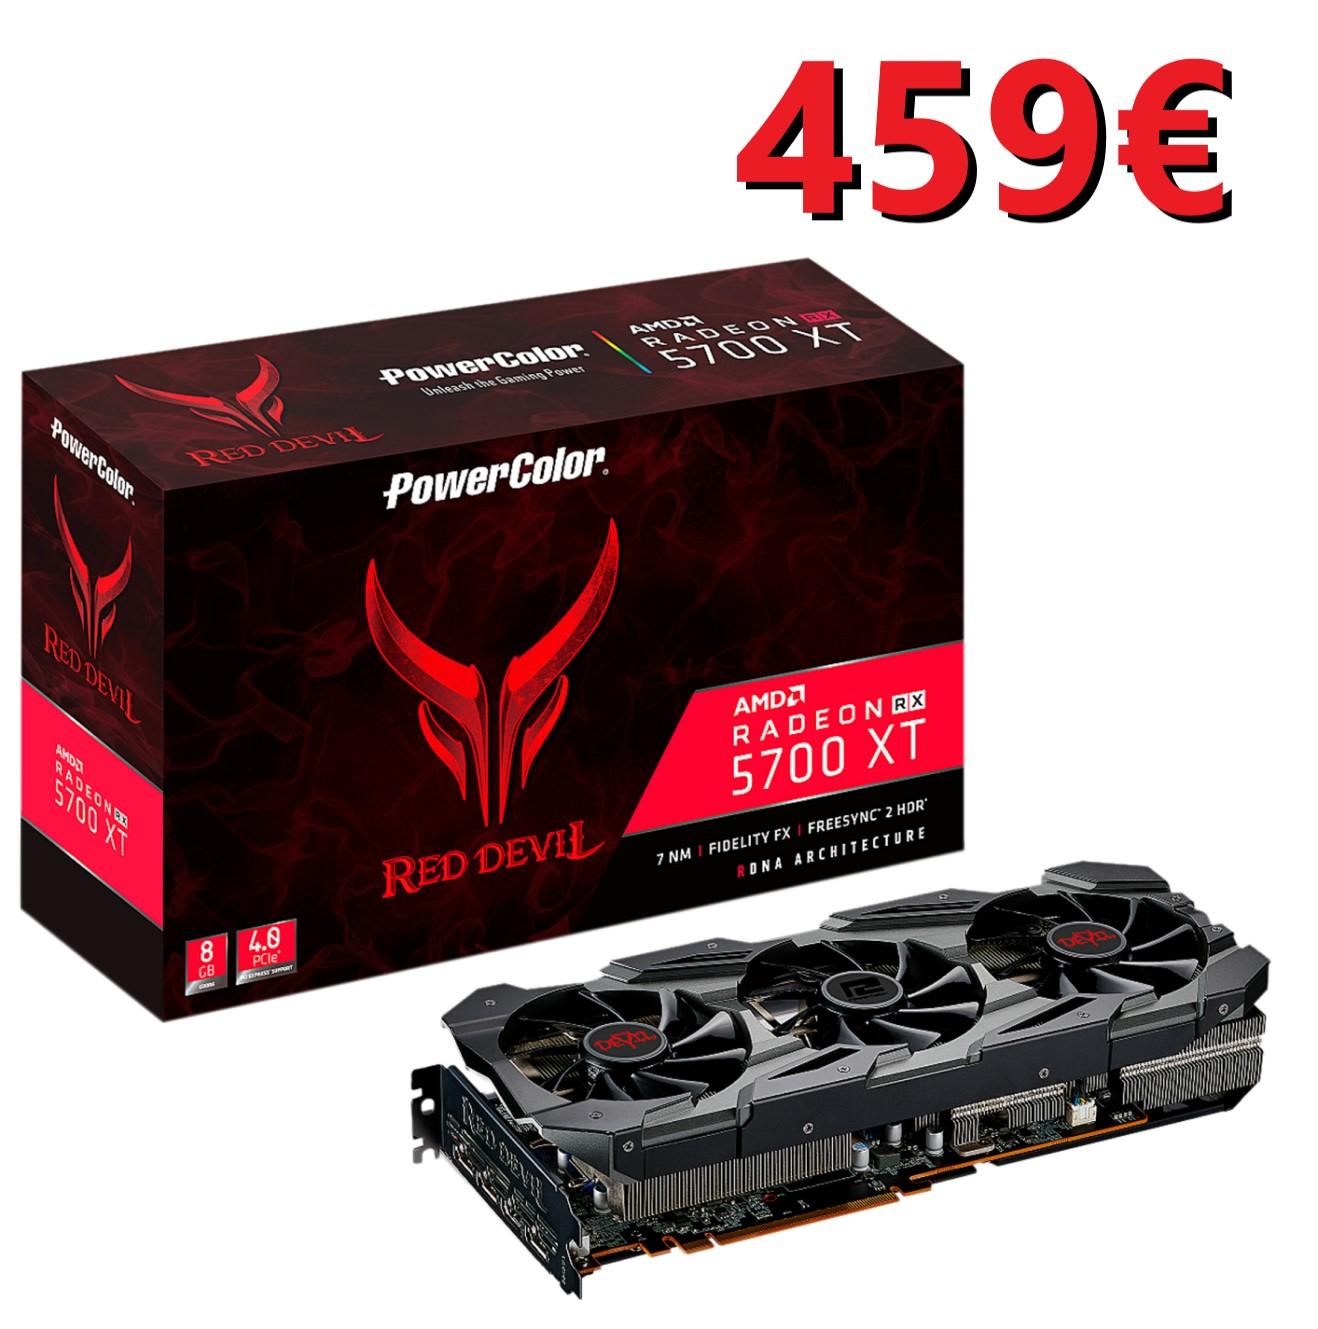 PowerColor Radeon RX 5700 XT Red Devil 8GB GDDR6 por 459€